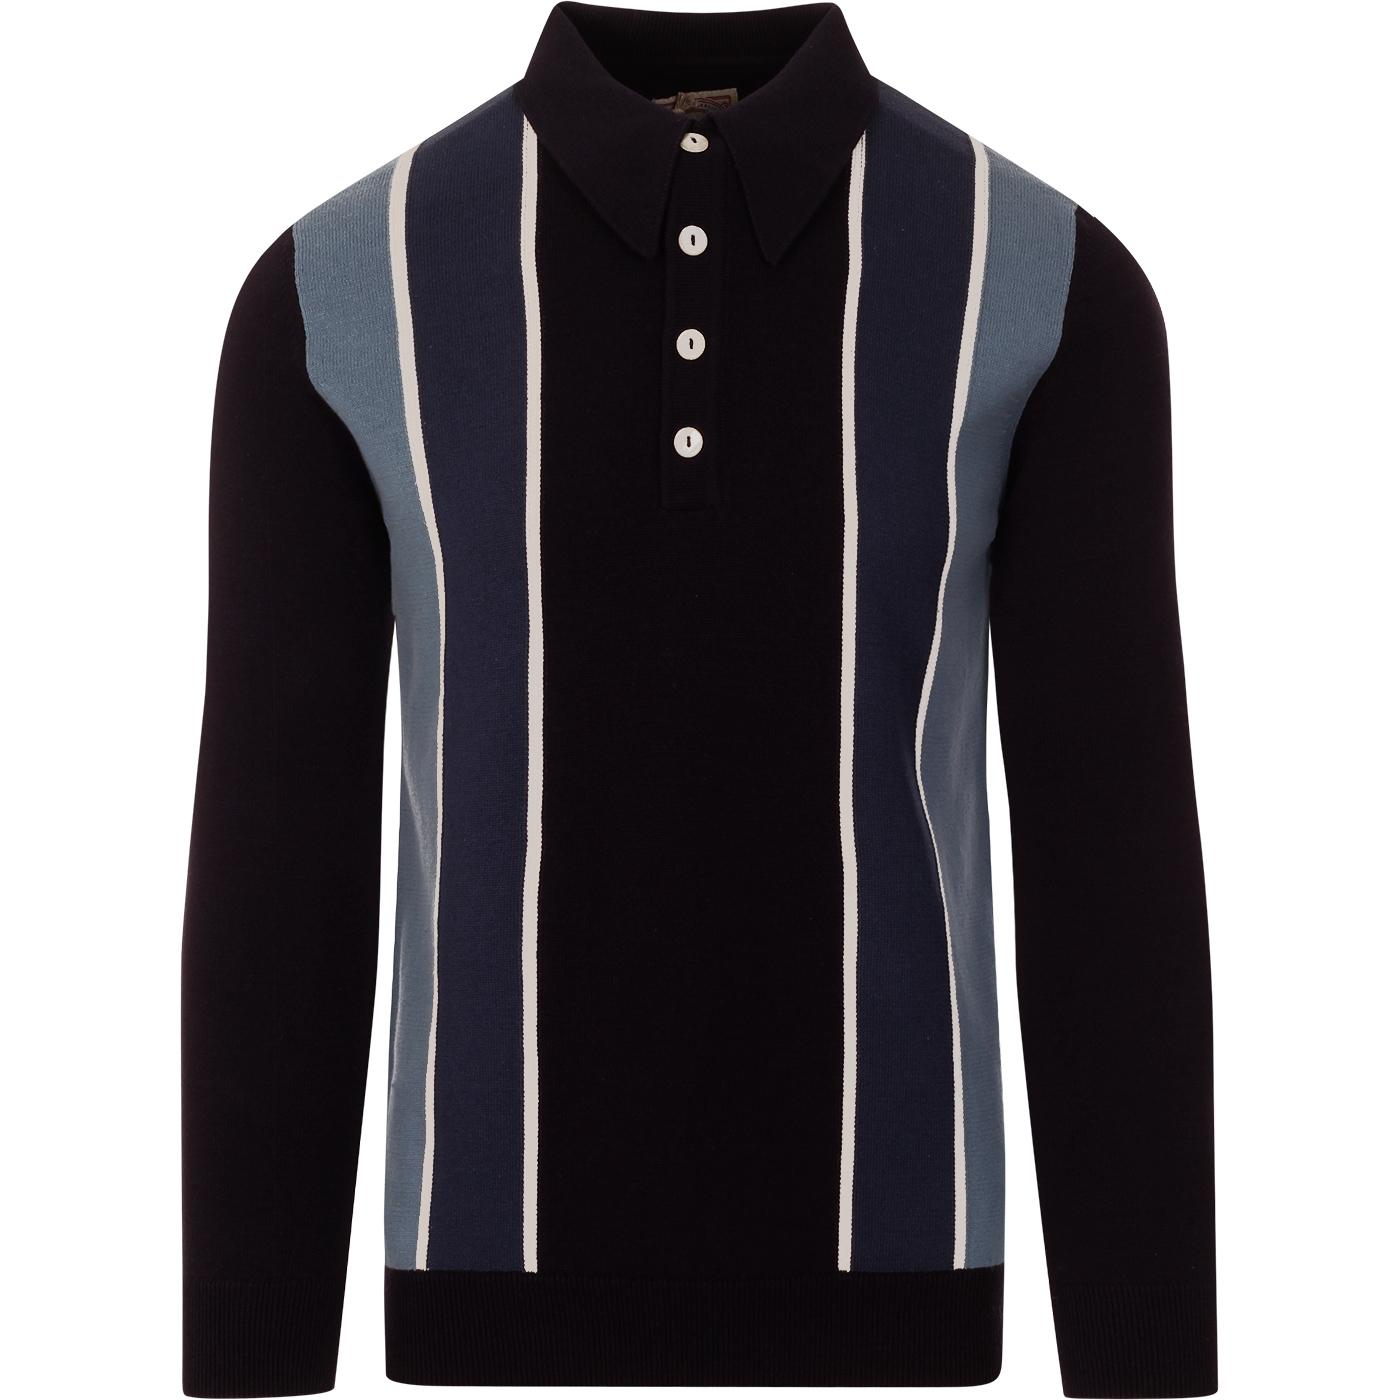 SKA & SOUL Mod Vintage Americana Stripe Knit Polo